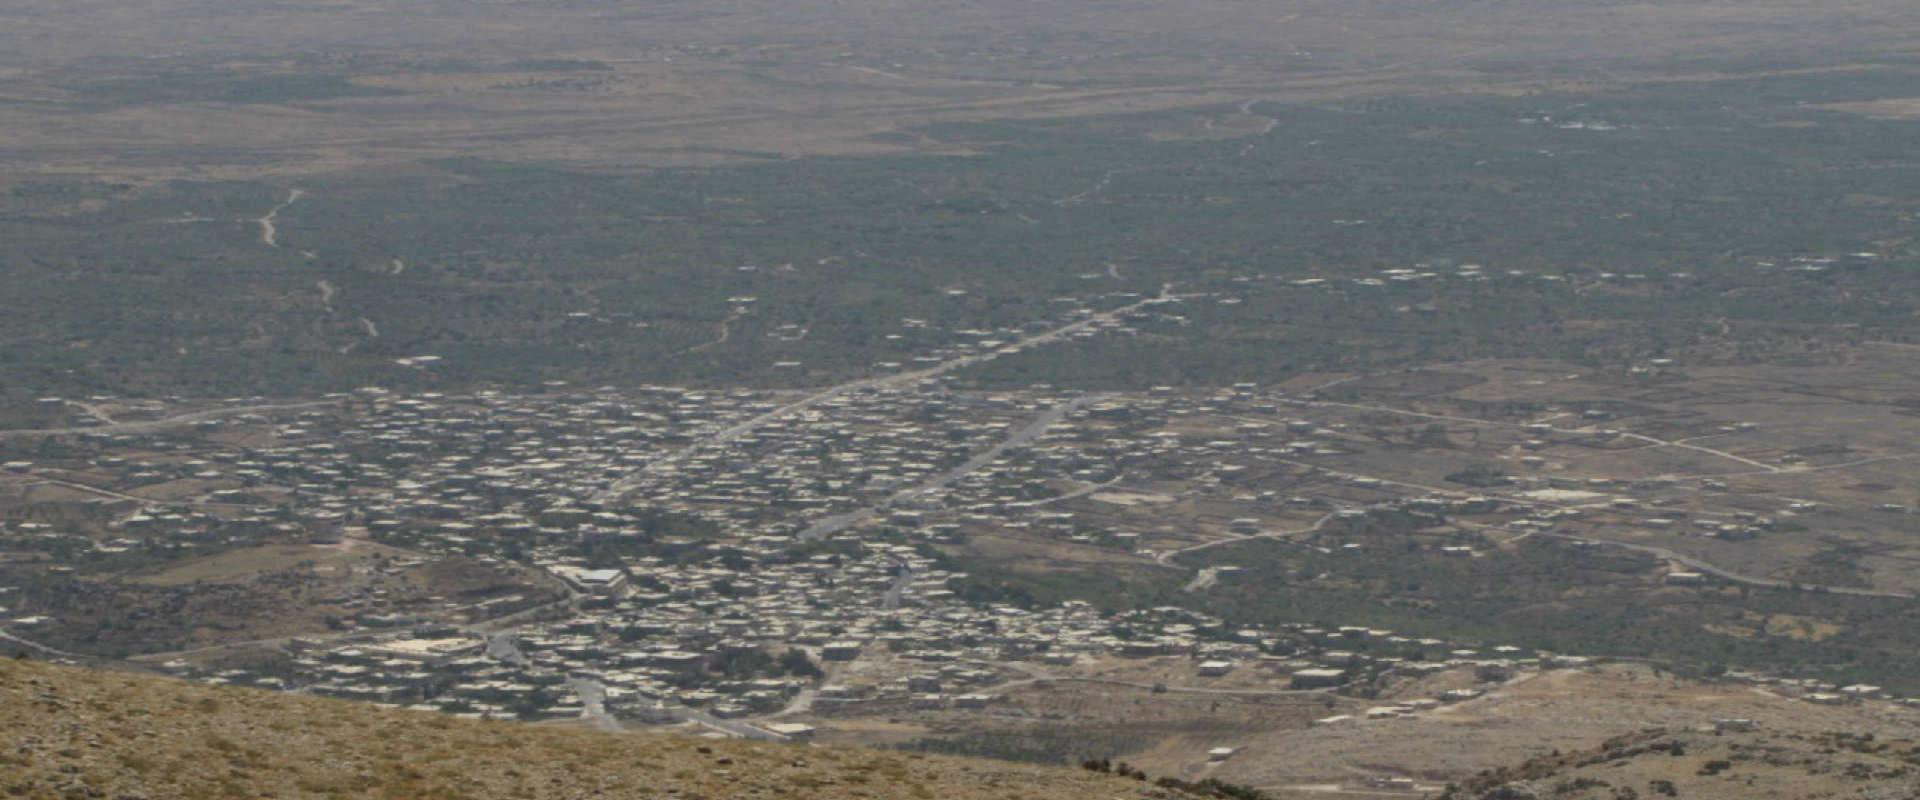 הכפר חאדר שבגולן הסורי